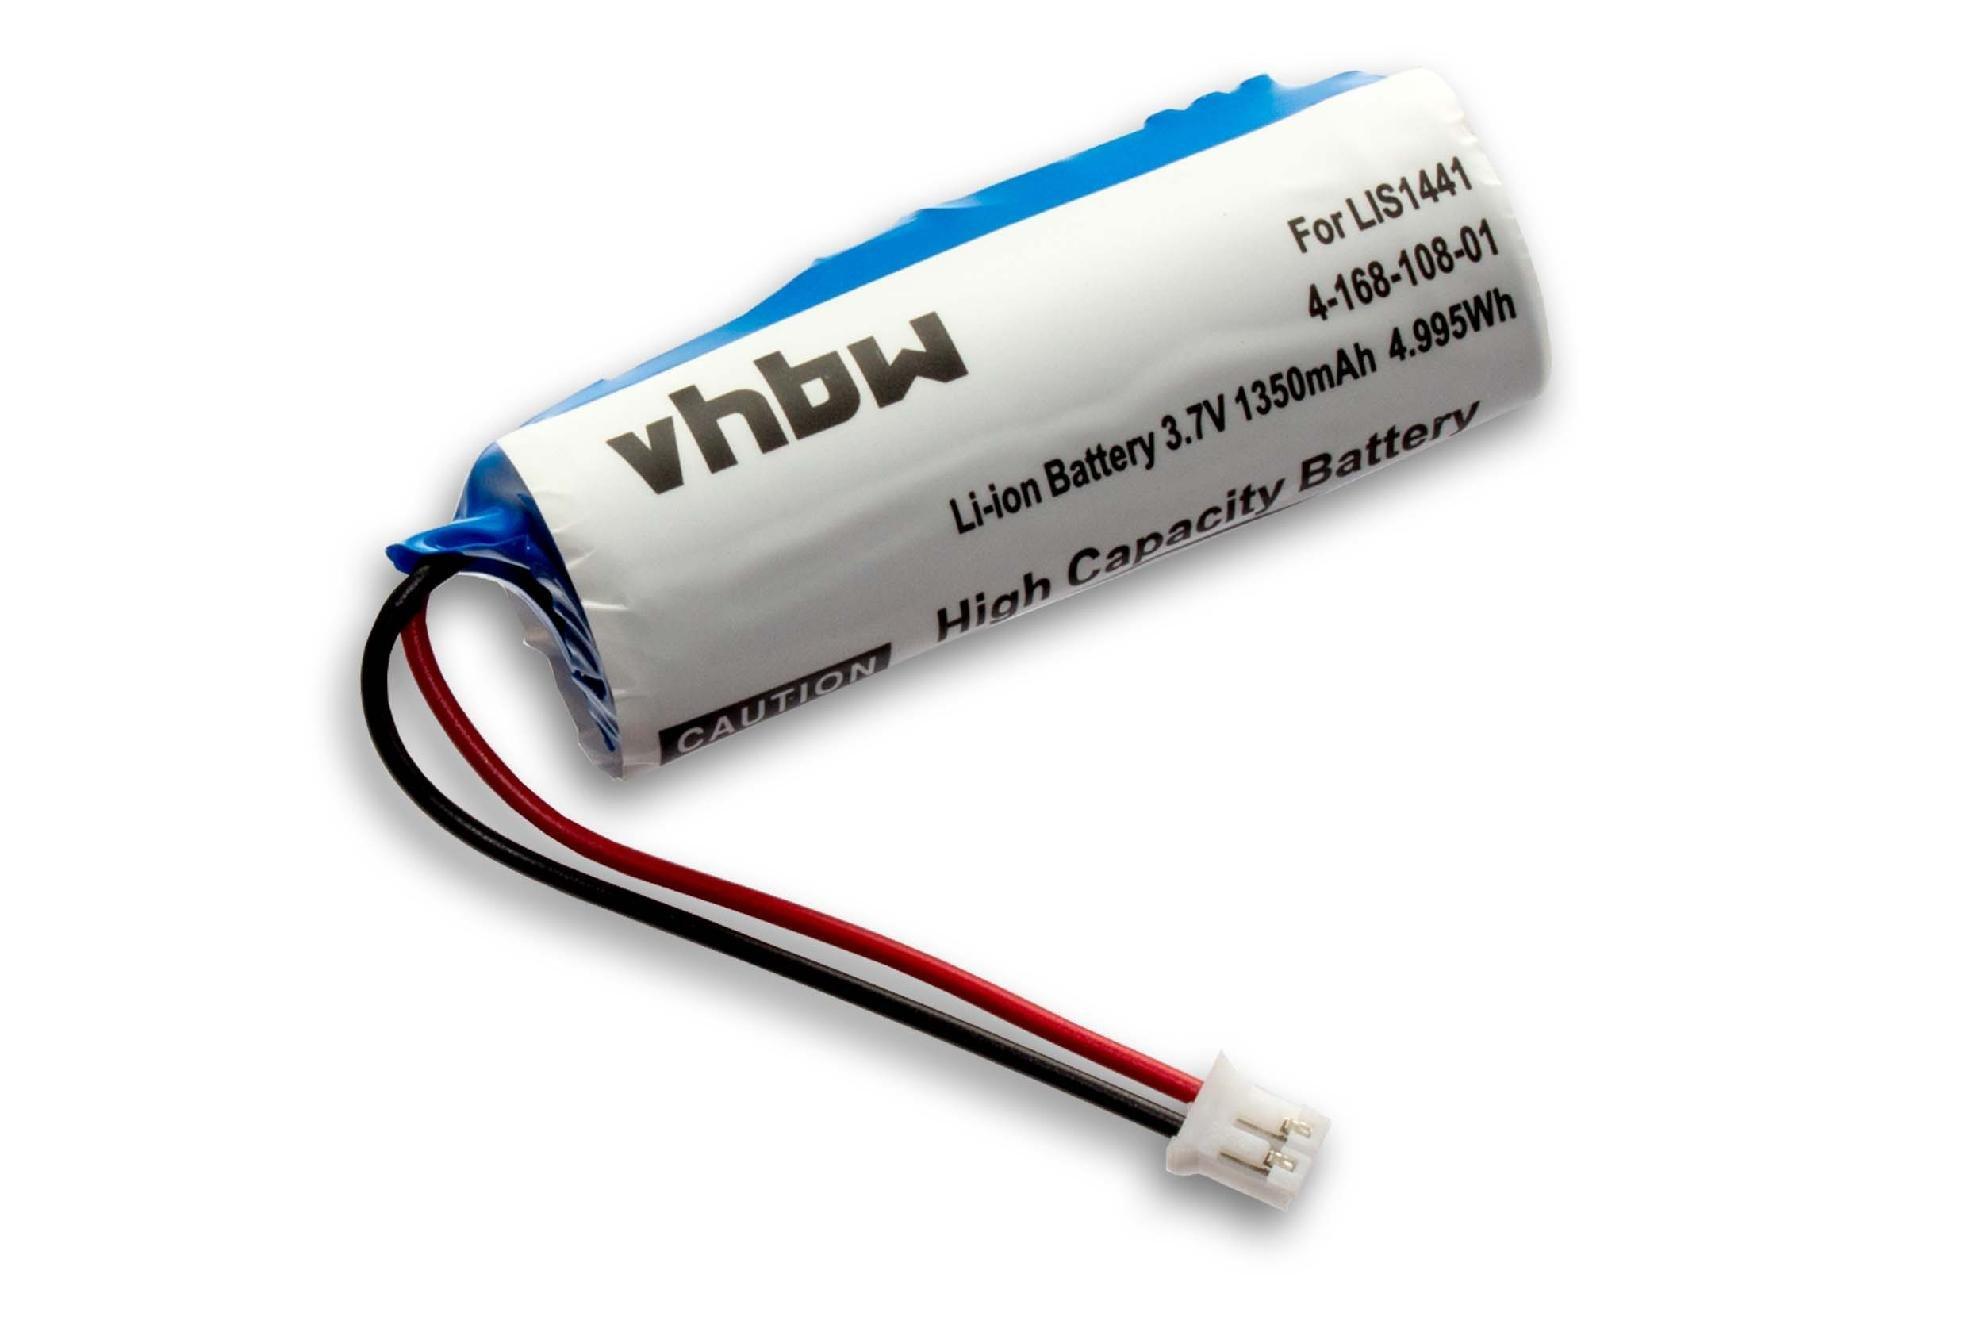 vhbw Batería compatible con Sony Playstation PS3 & PS4 Move Motion mando CECH-ZCM1E reemplaza LIS1441, LIP1450, 4-168-108-1 (Li-Ion, 1350mAh, 3.7V): Amazon.es ...